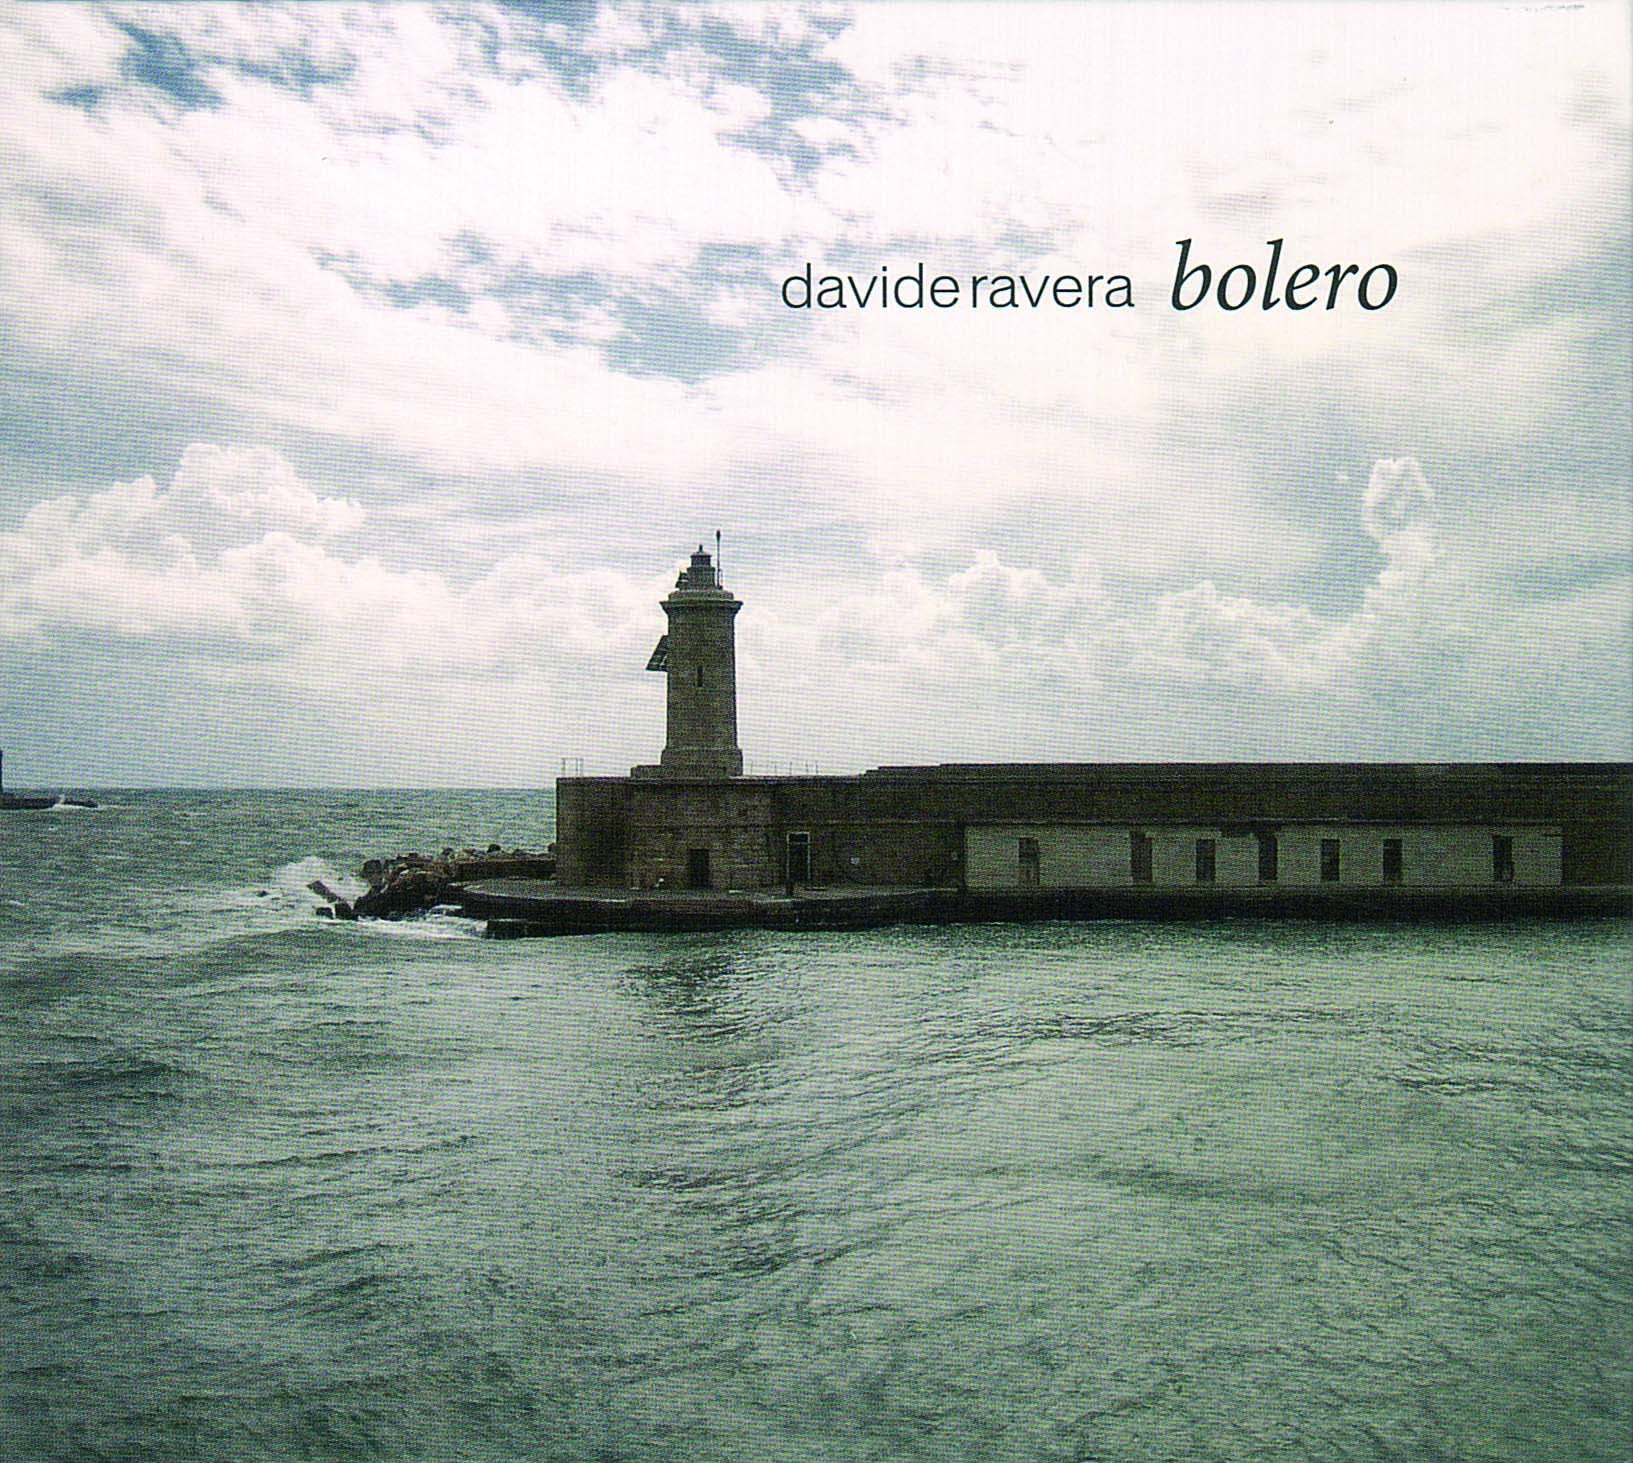 DAVIDE RAVERA